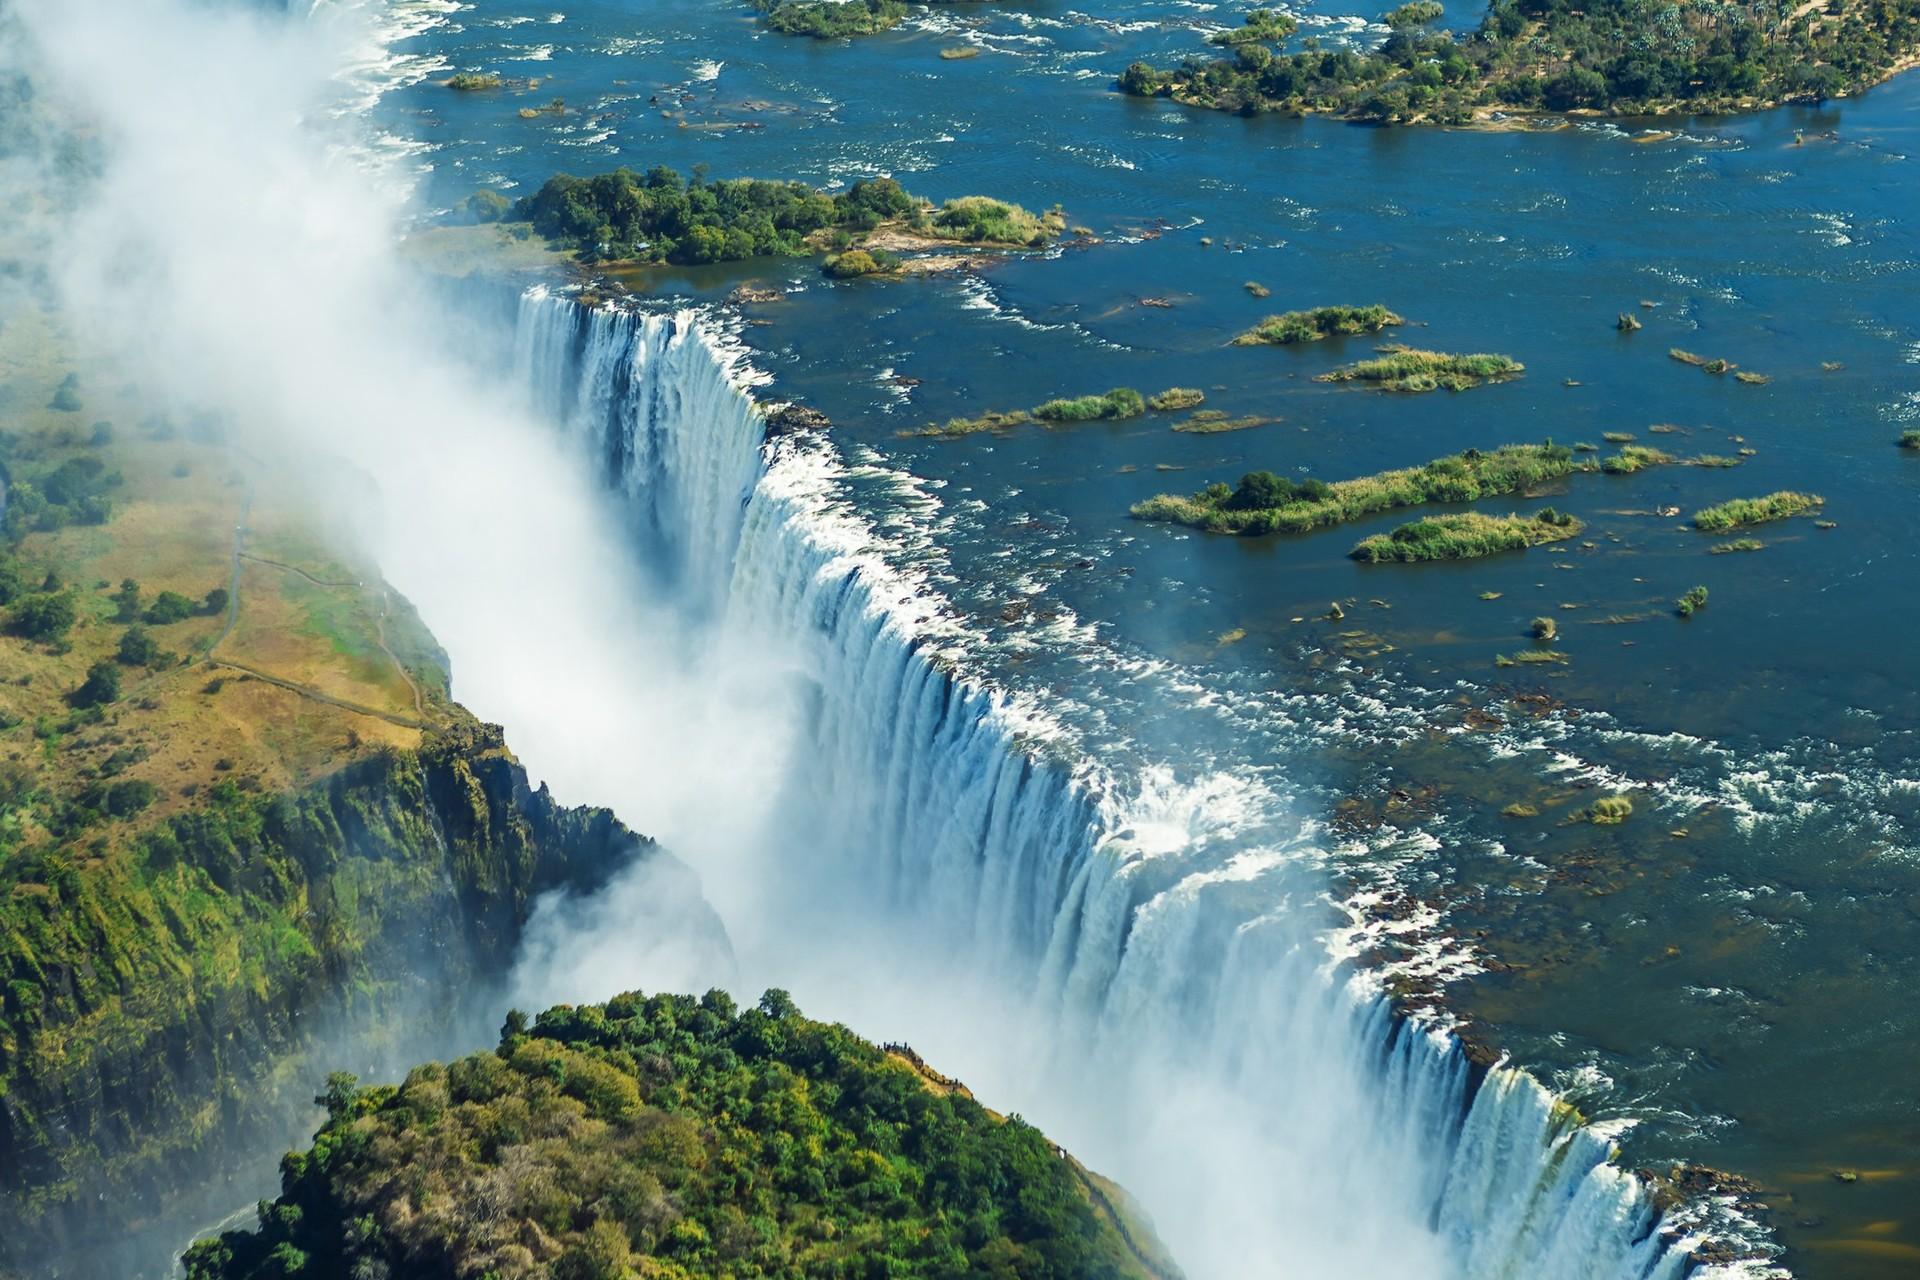 Zimbabwe's best natural attractions: Victoria Falls